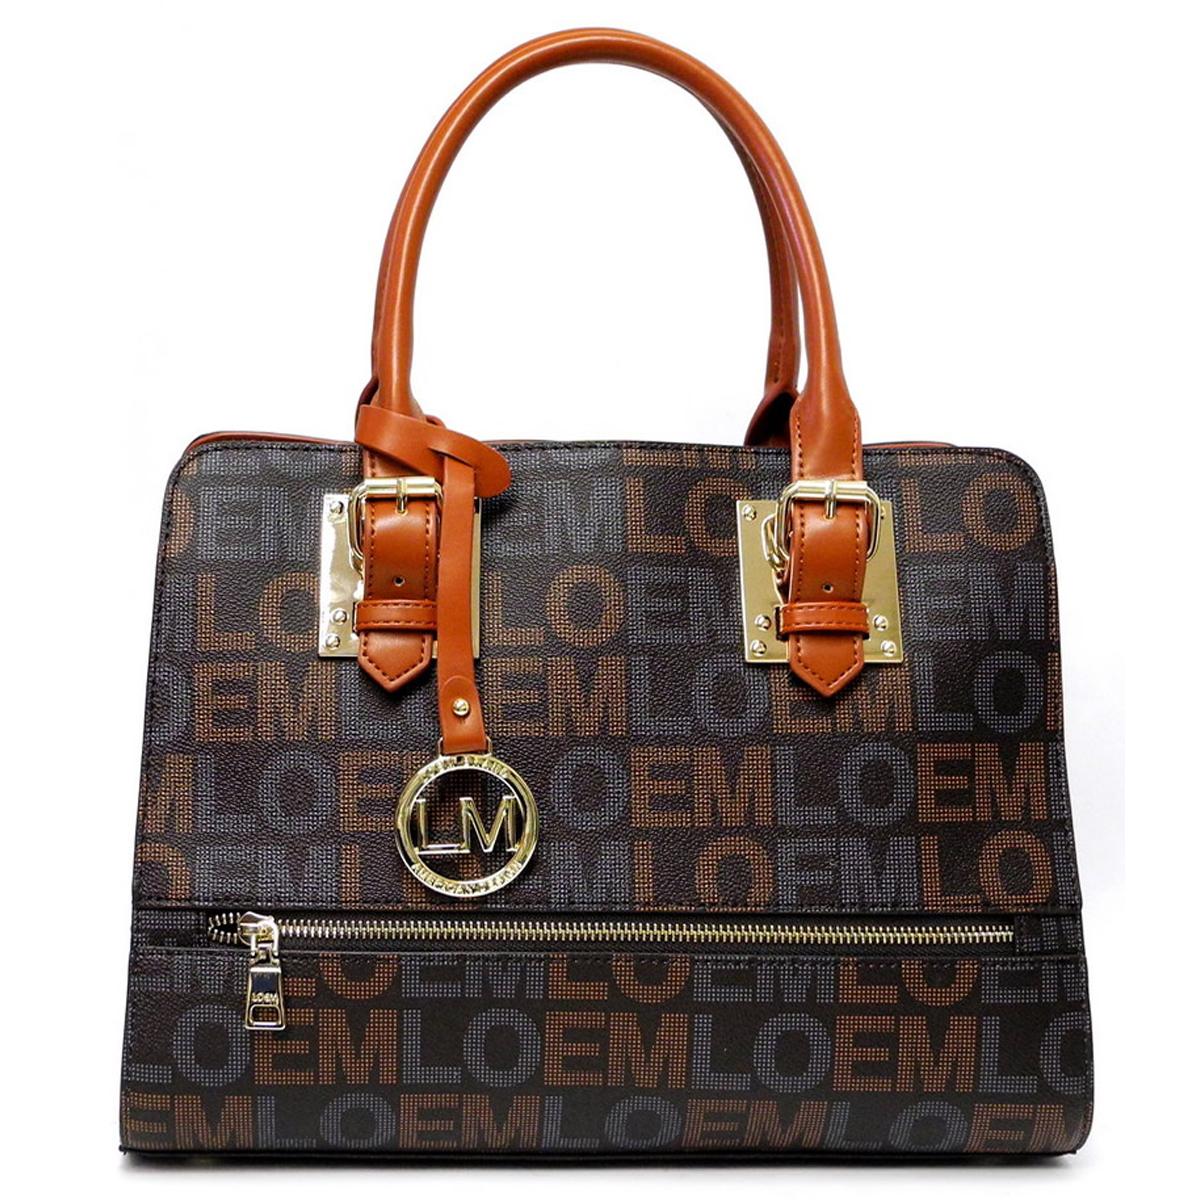 Loem Handbag G Style Amp Signature Handbags Onsale Handbag